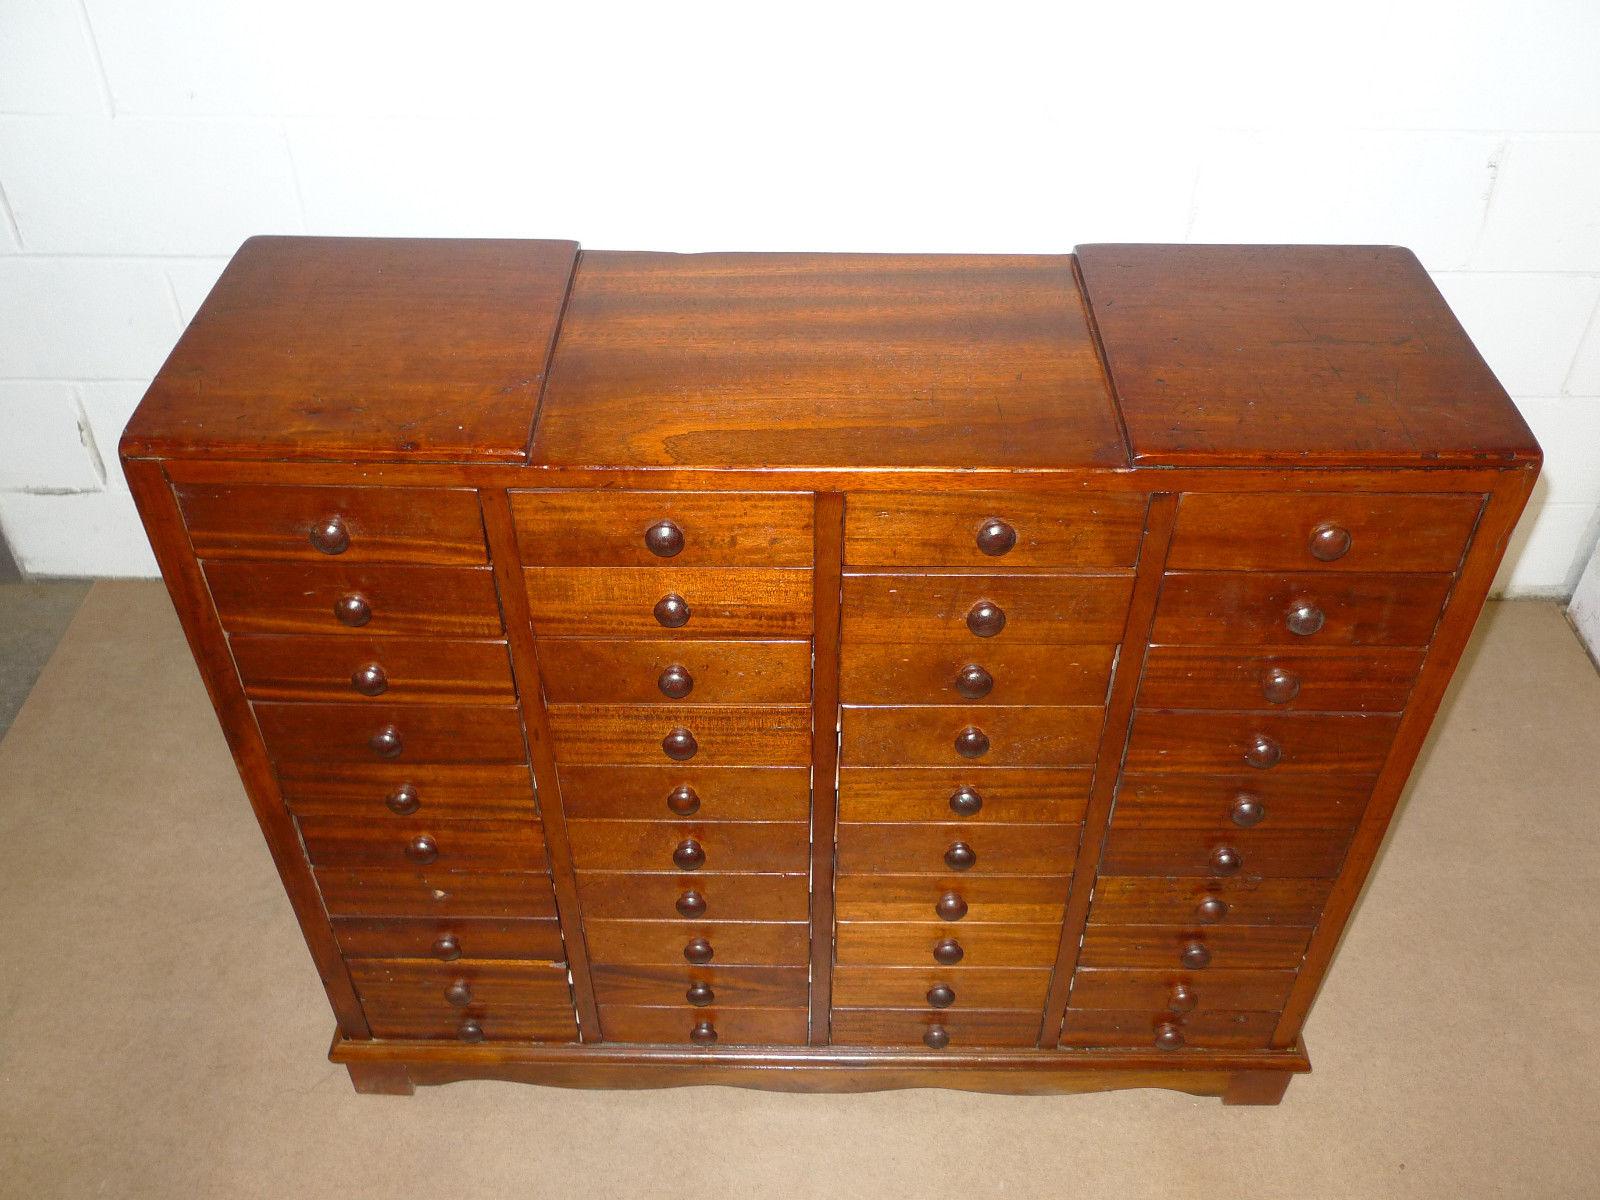 AmerMission Solid Mahogany Apothecary Cabinet 18001899